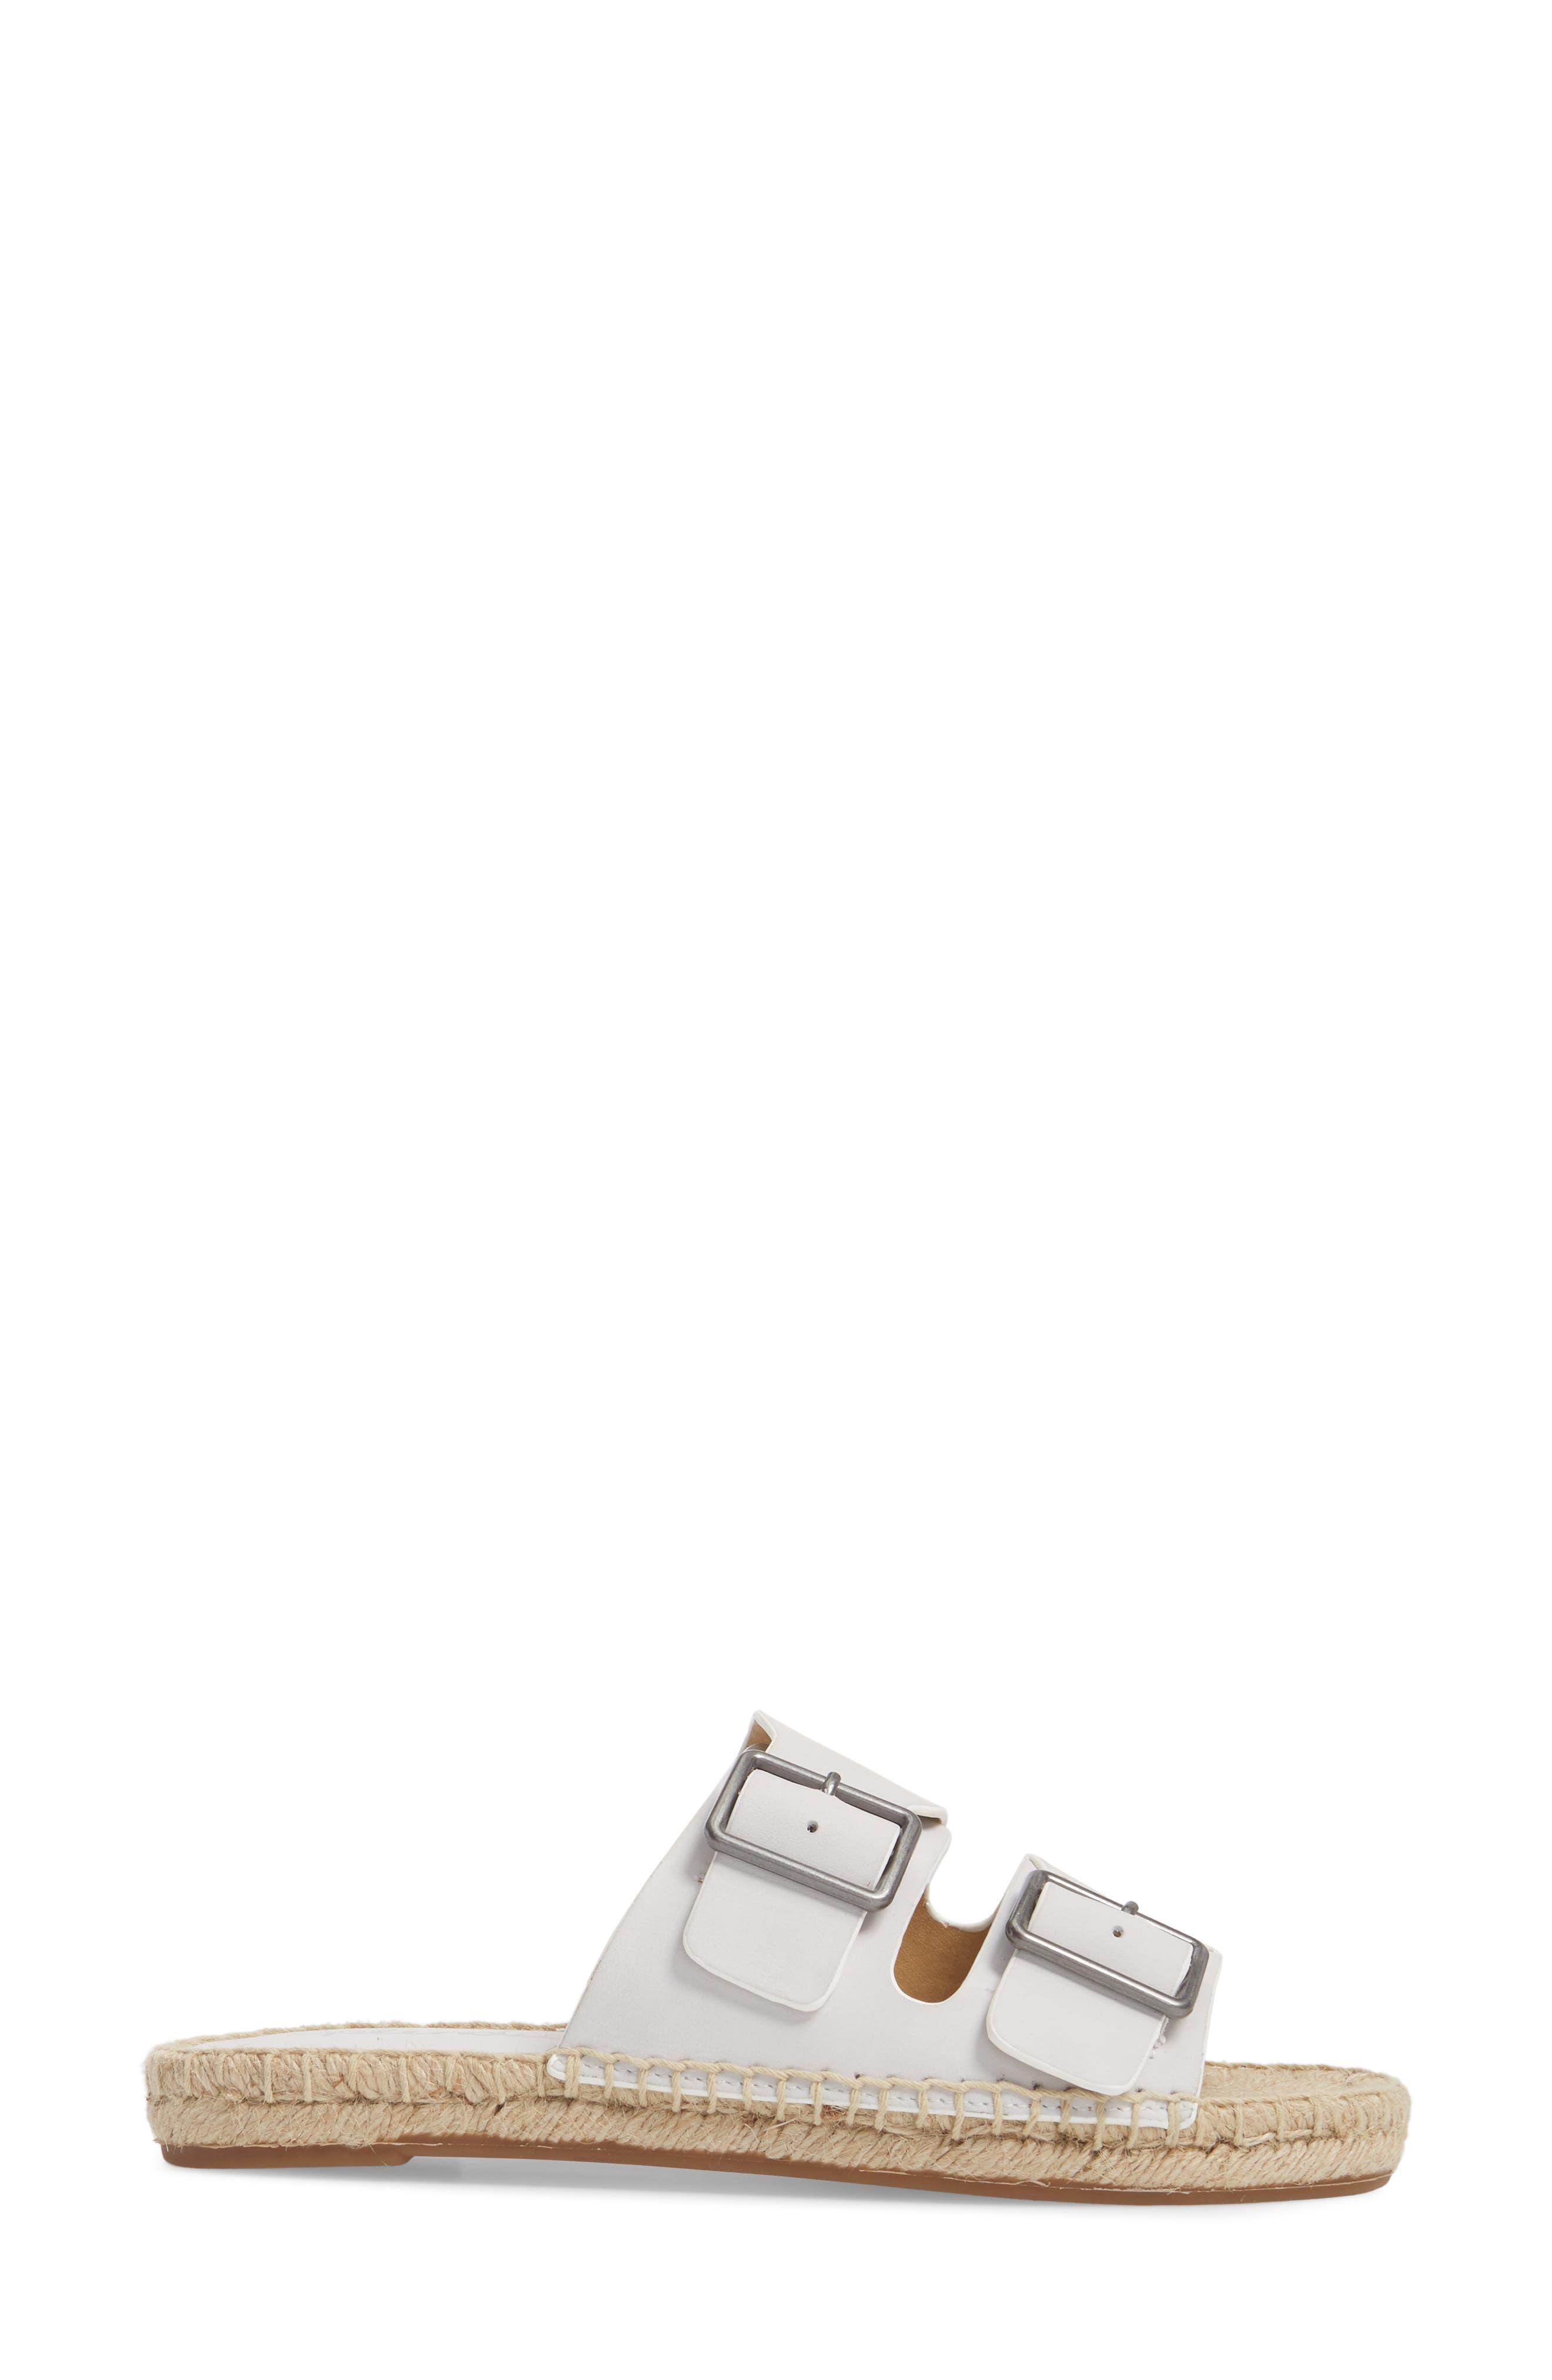 Blake Buckle Espadrille Sandal,                             Alternate thumbnail 3, color,                             White Leather